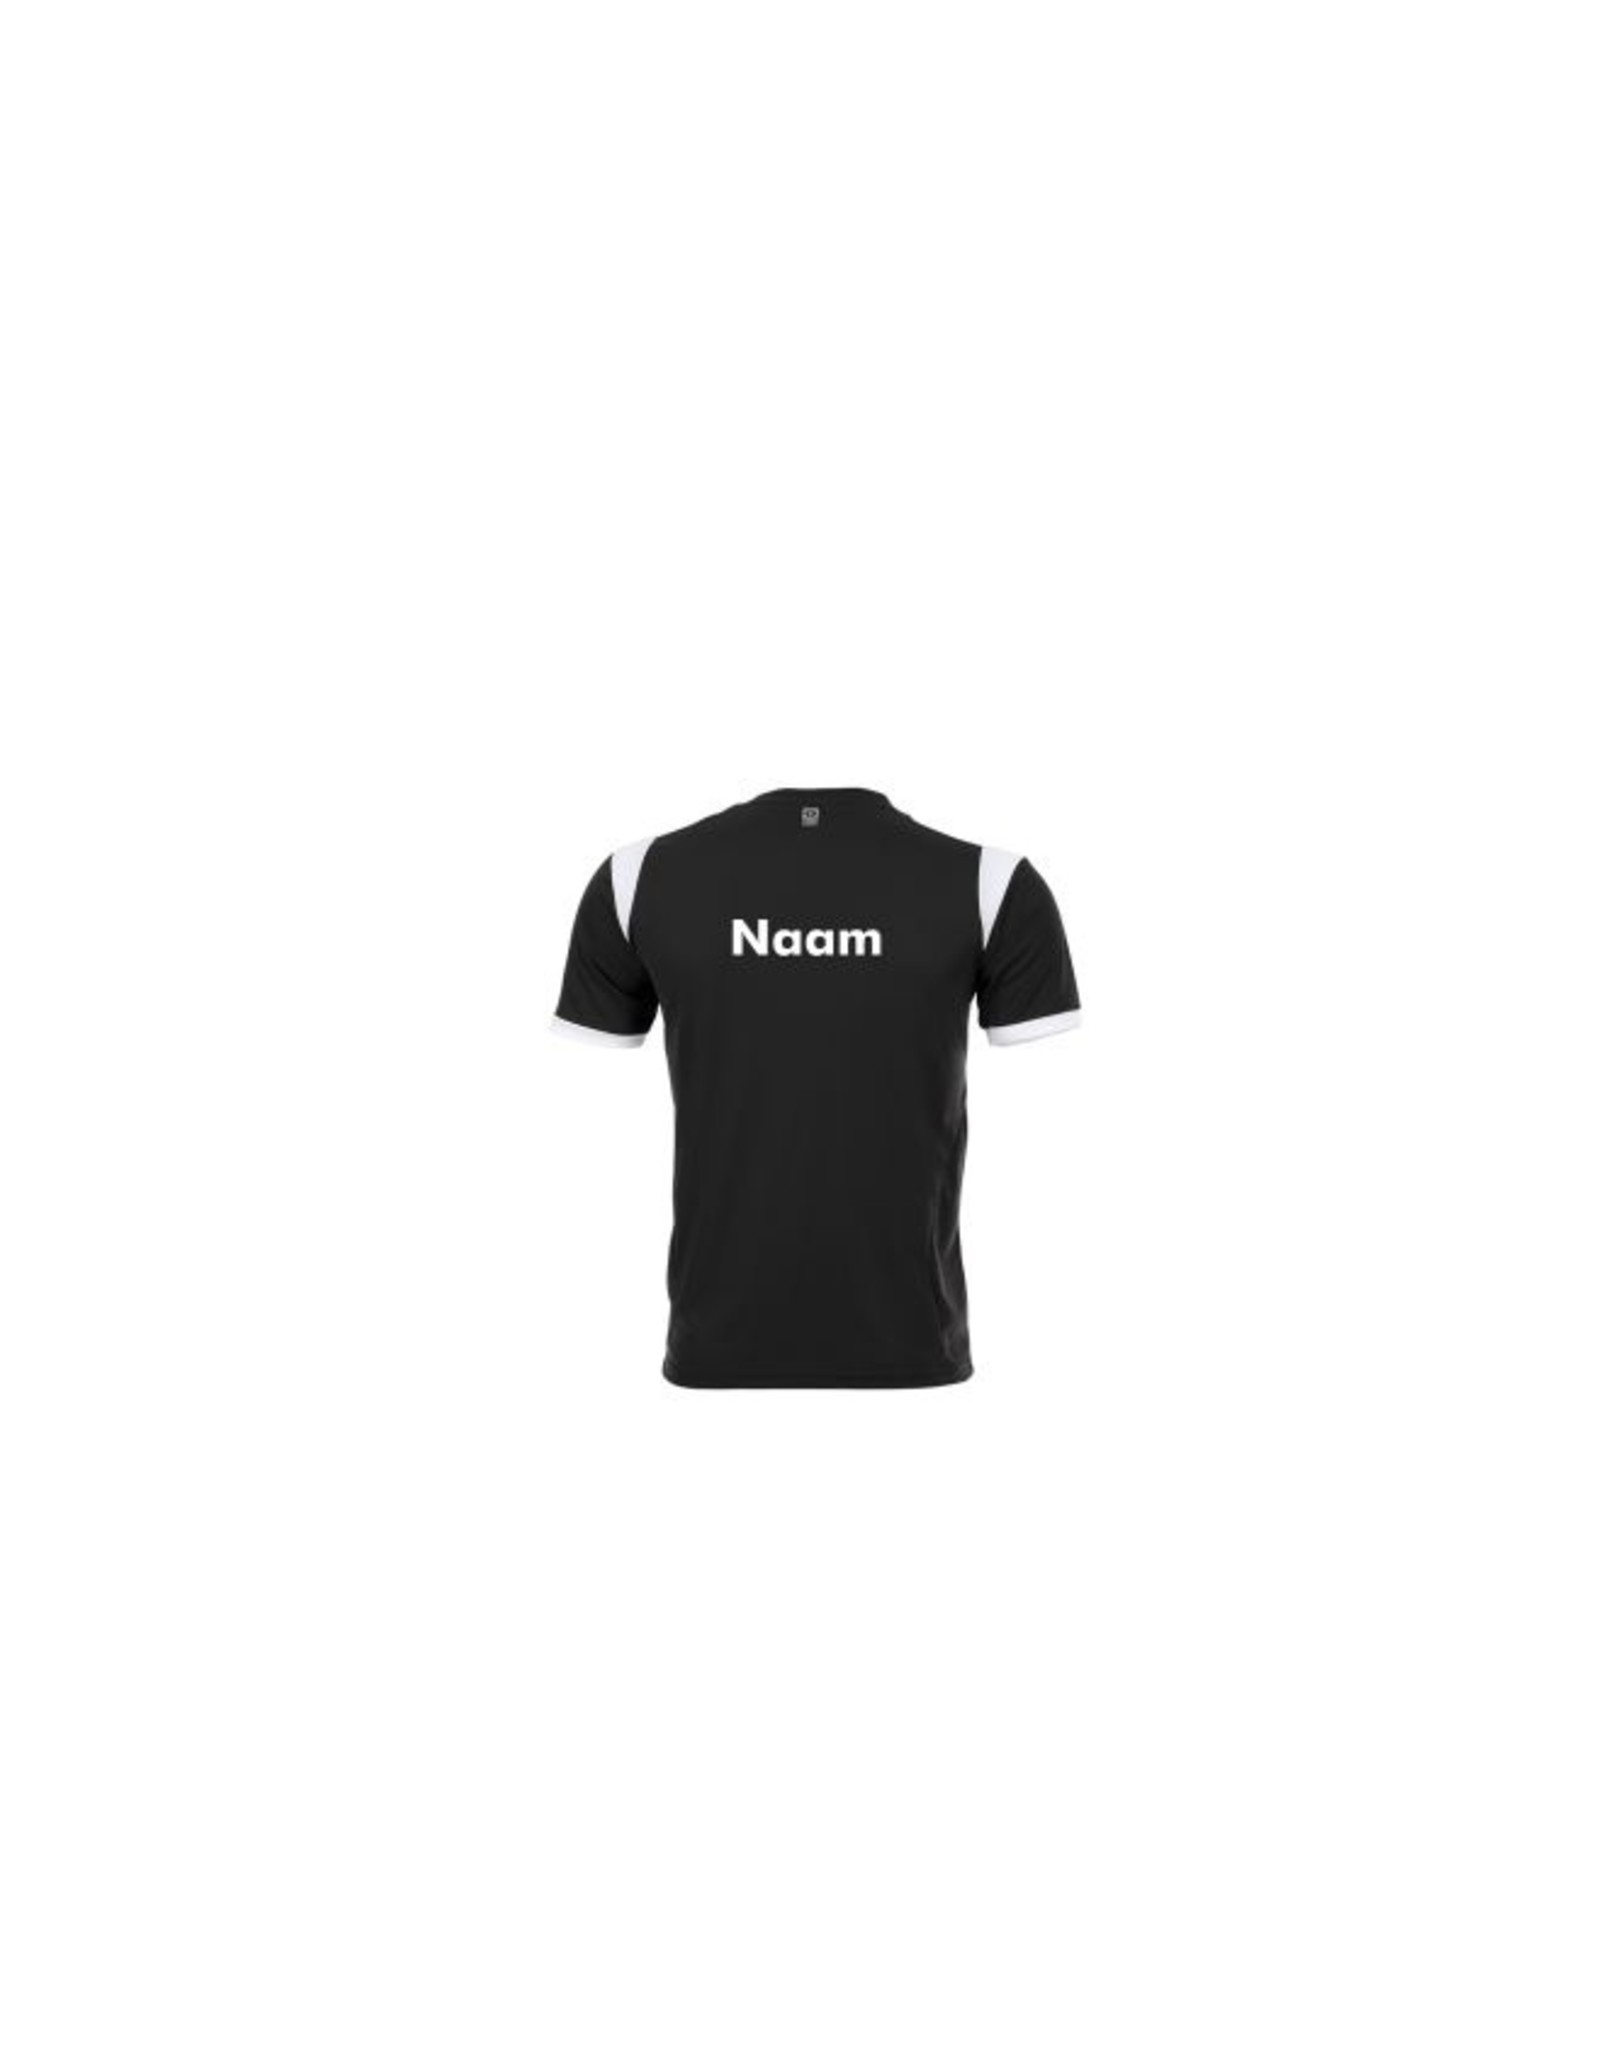 Hummel Stanislas shirt Reinier de Graaf